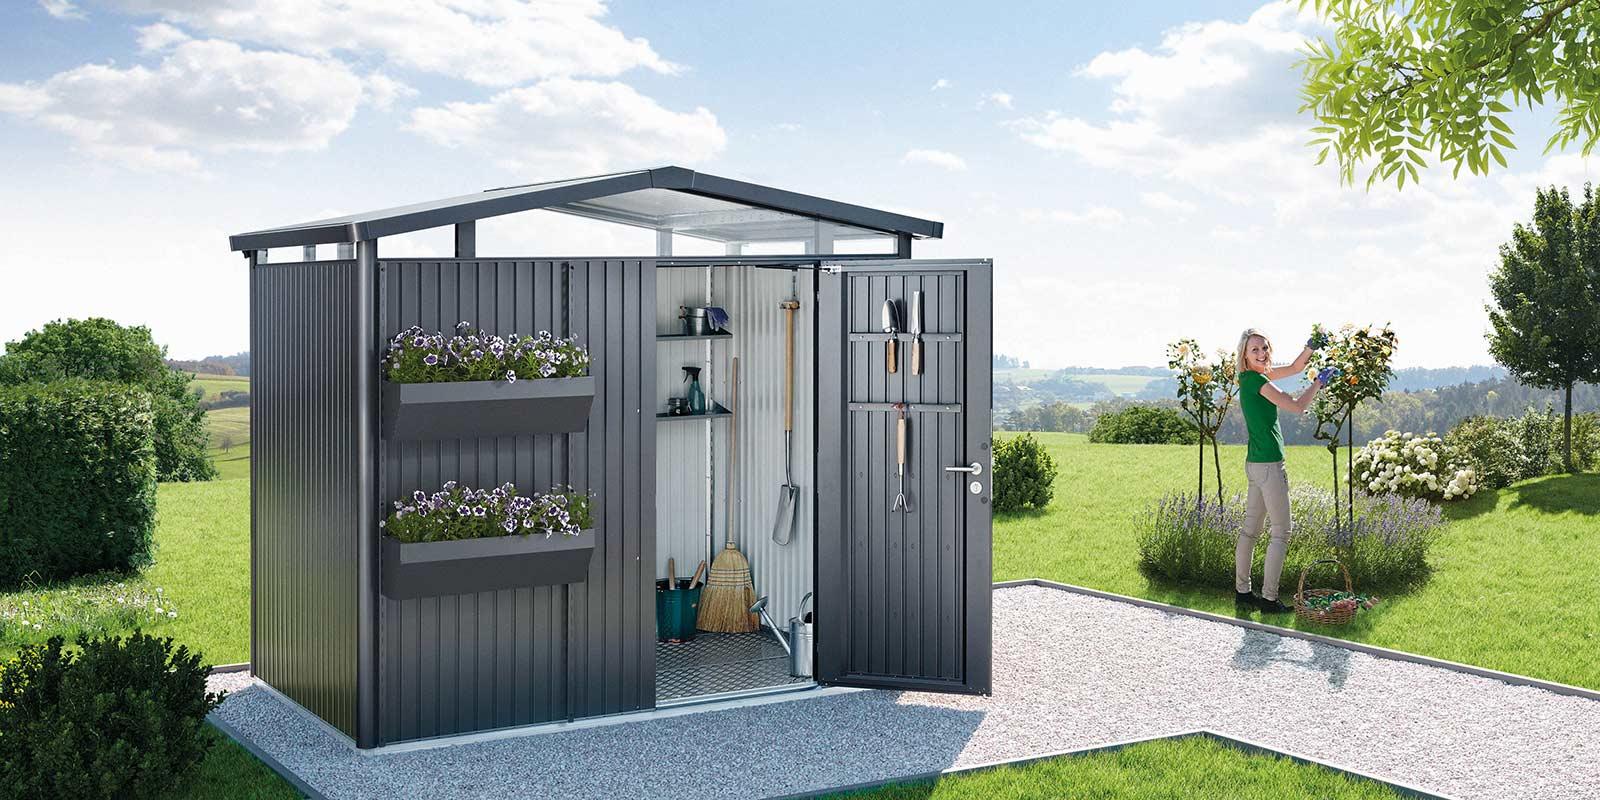 Modern Garden Sheds From Austria - Biohort destiné Biohort